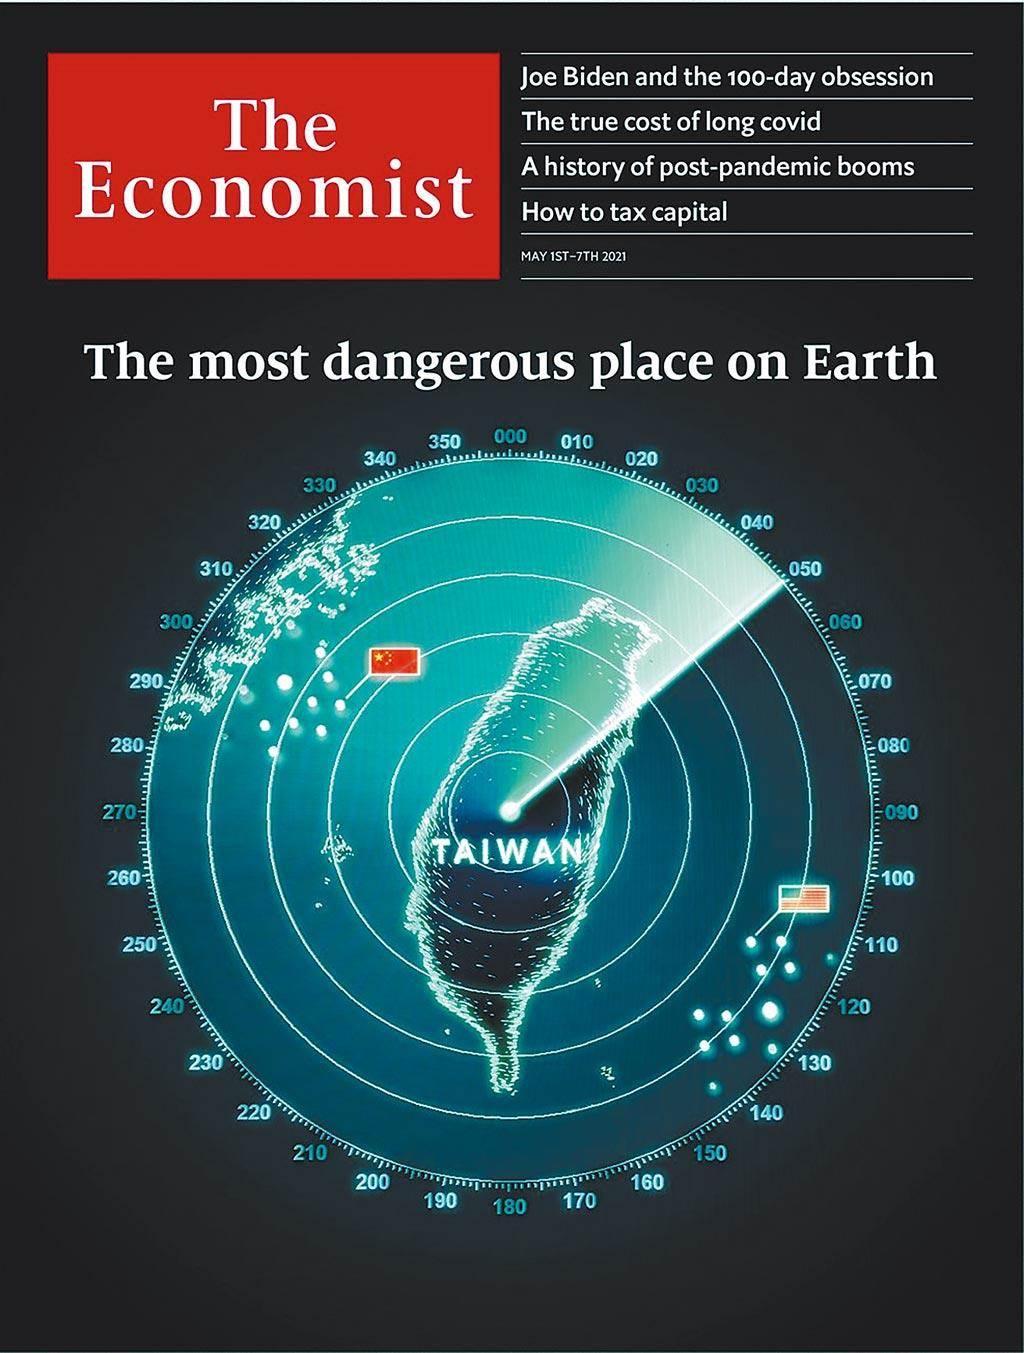 《經濟學人》封面。(摘自twitter@TheEconomist)